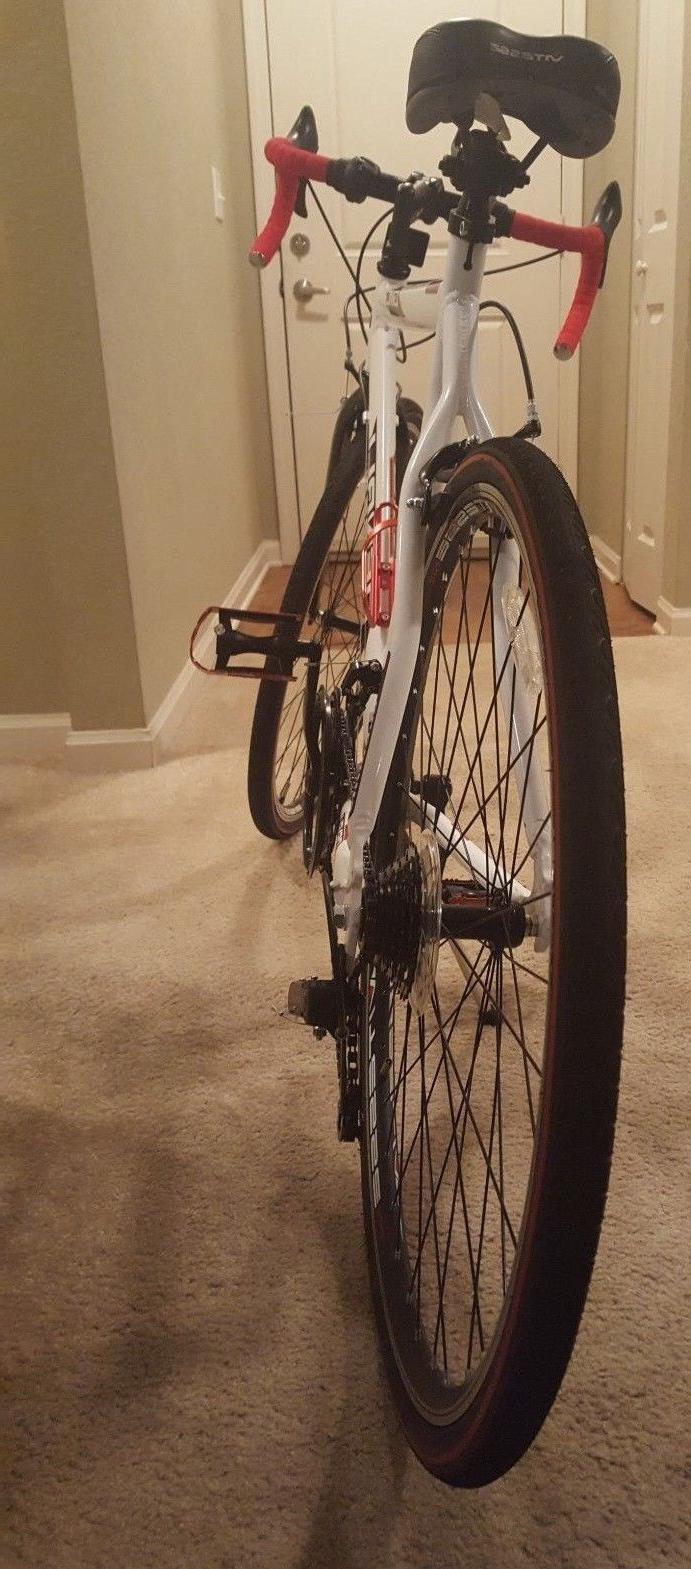 GMC Denali Bike 21-Speed Frame Men